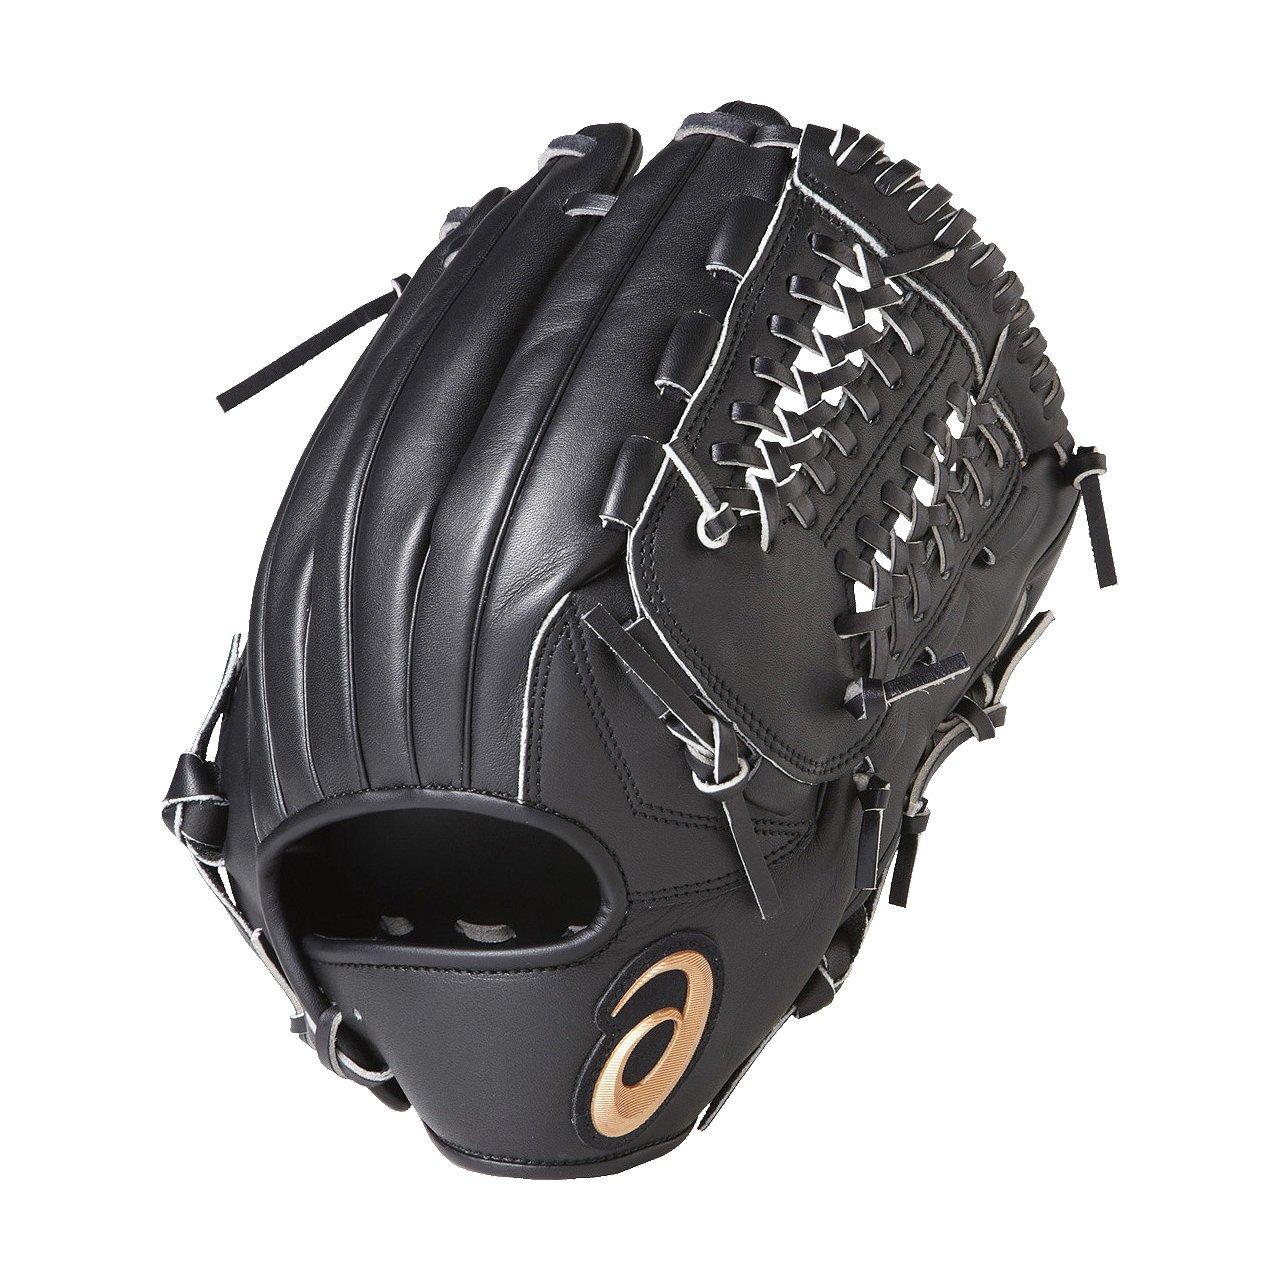 asics(アシックス) 野球 ソフトボール グローブ オールラウンド 右投げ 一般 ダイブ BGS7BB B06X3WHF3Rブラック